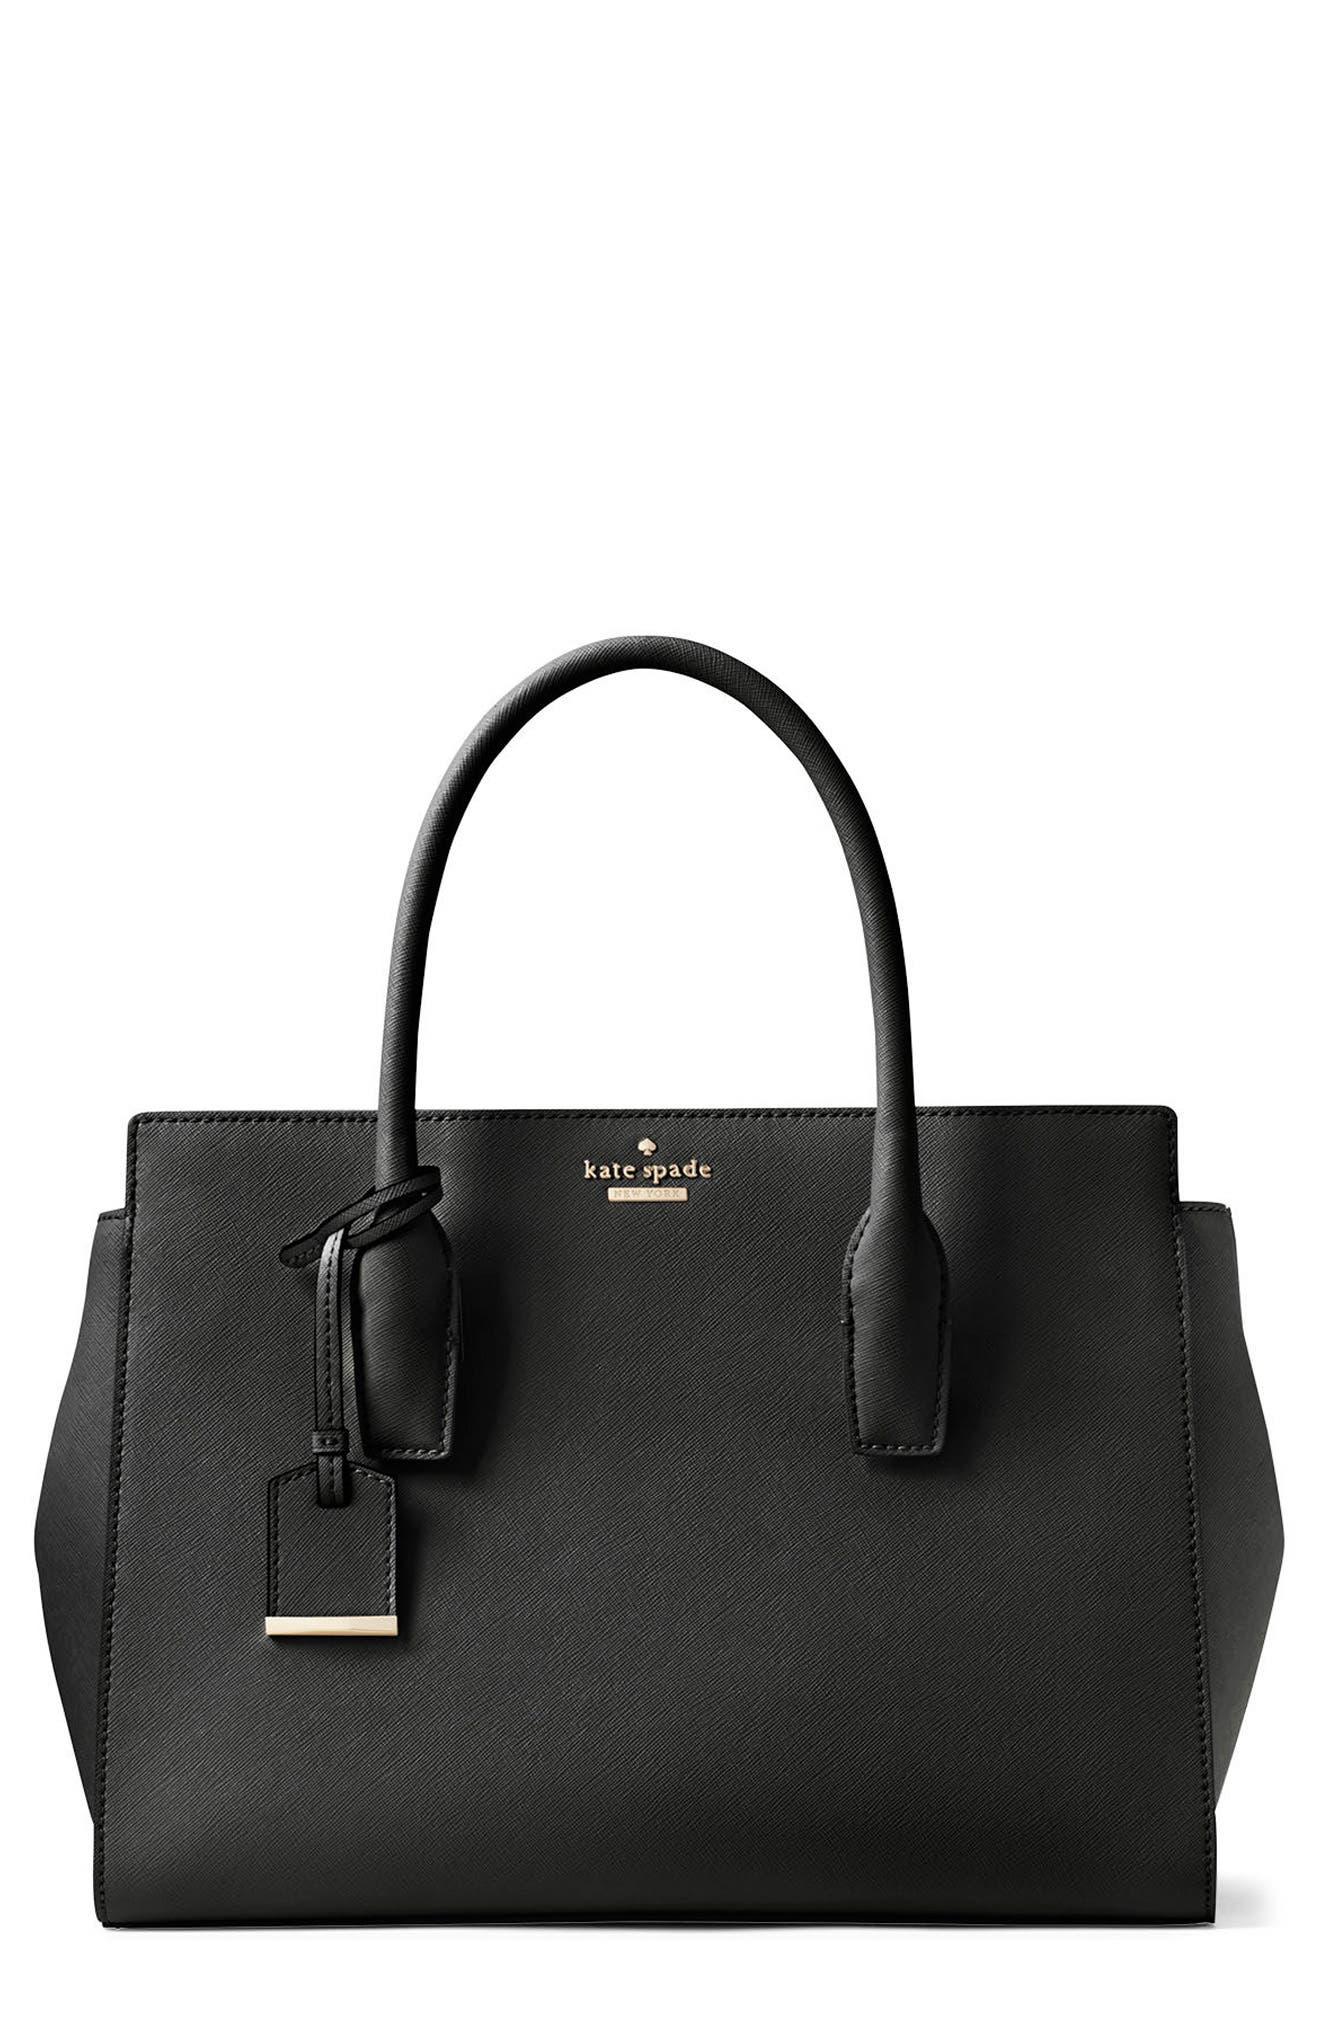 kate spade new york make it mine - candace leather satchel